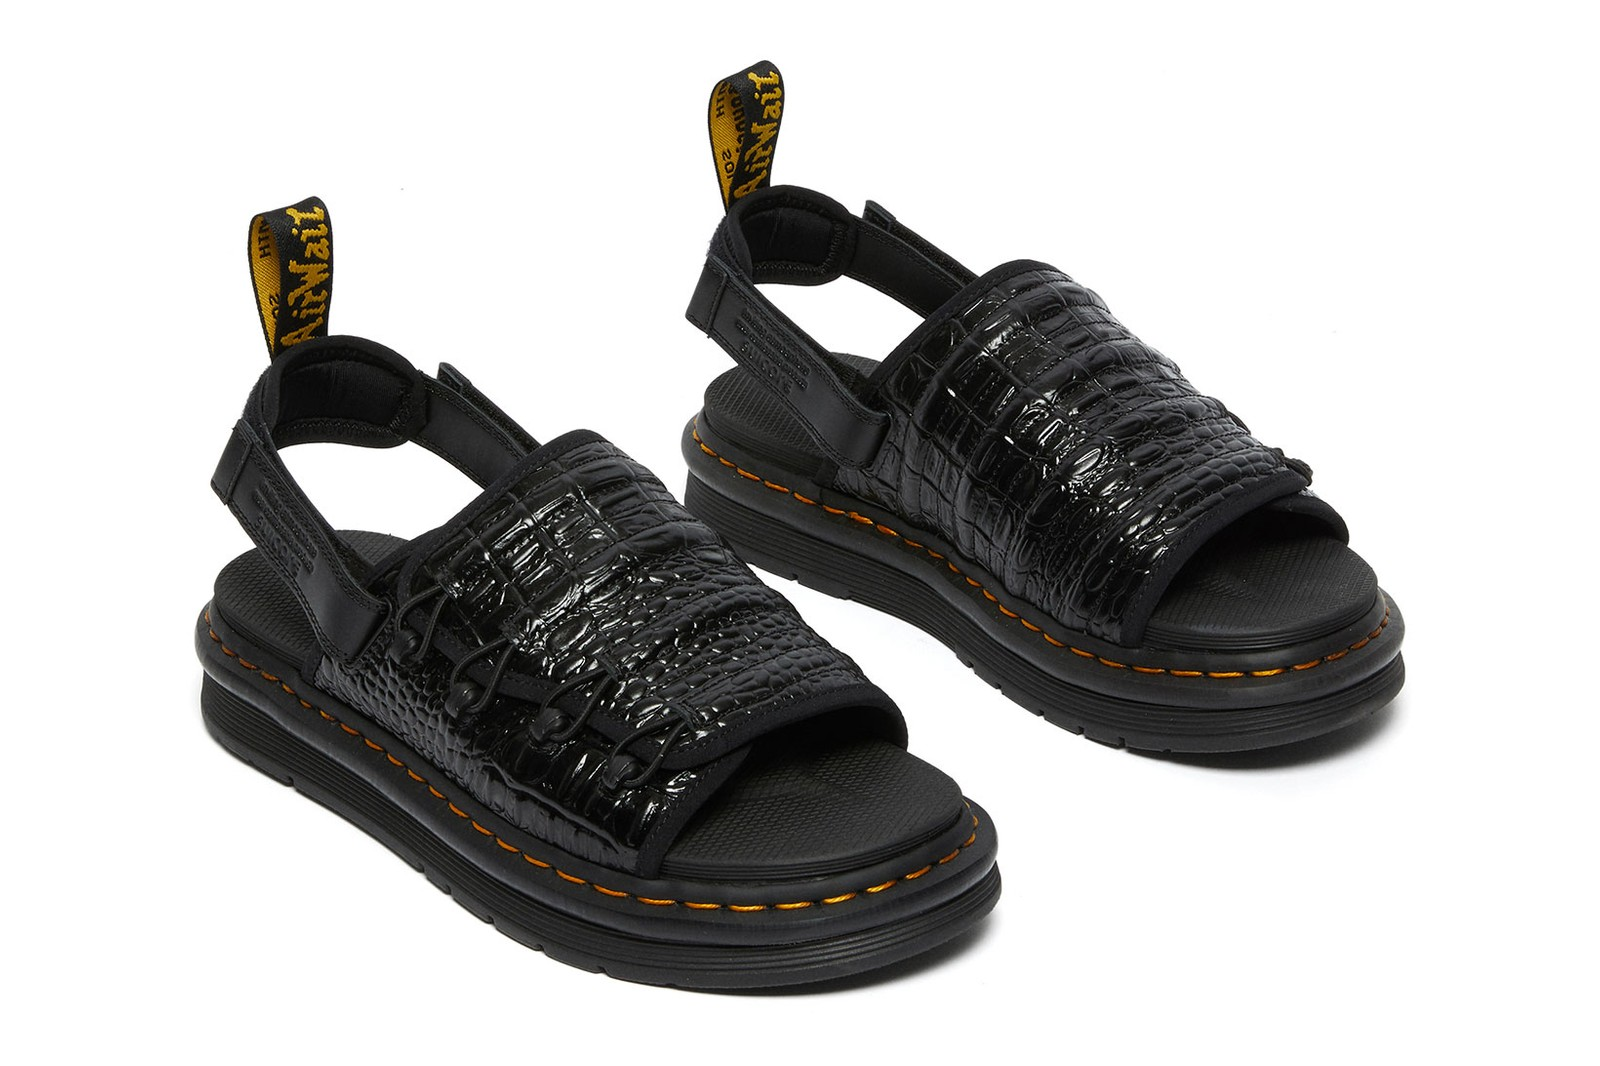 Dr. Martens Suicoke MURA Sandals Slip-On Collaboration Release Date Info